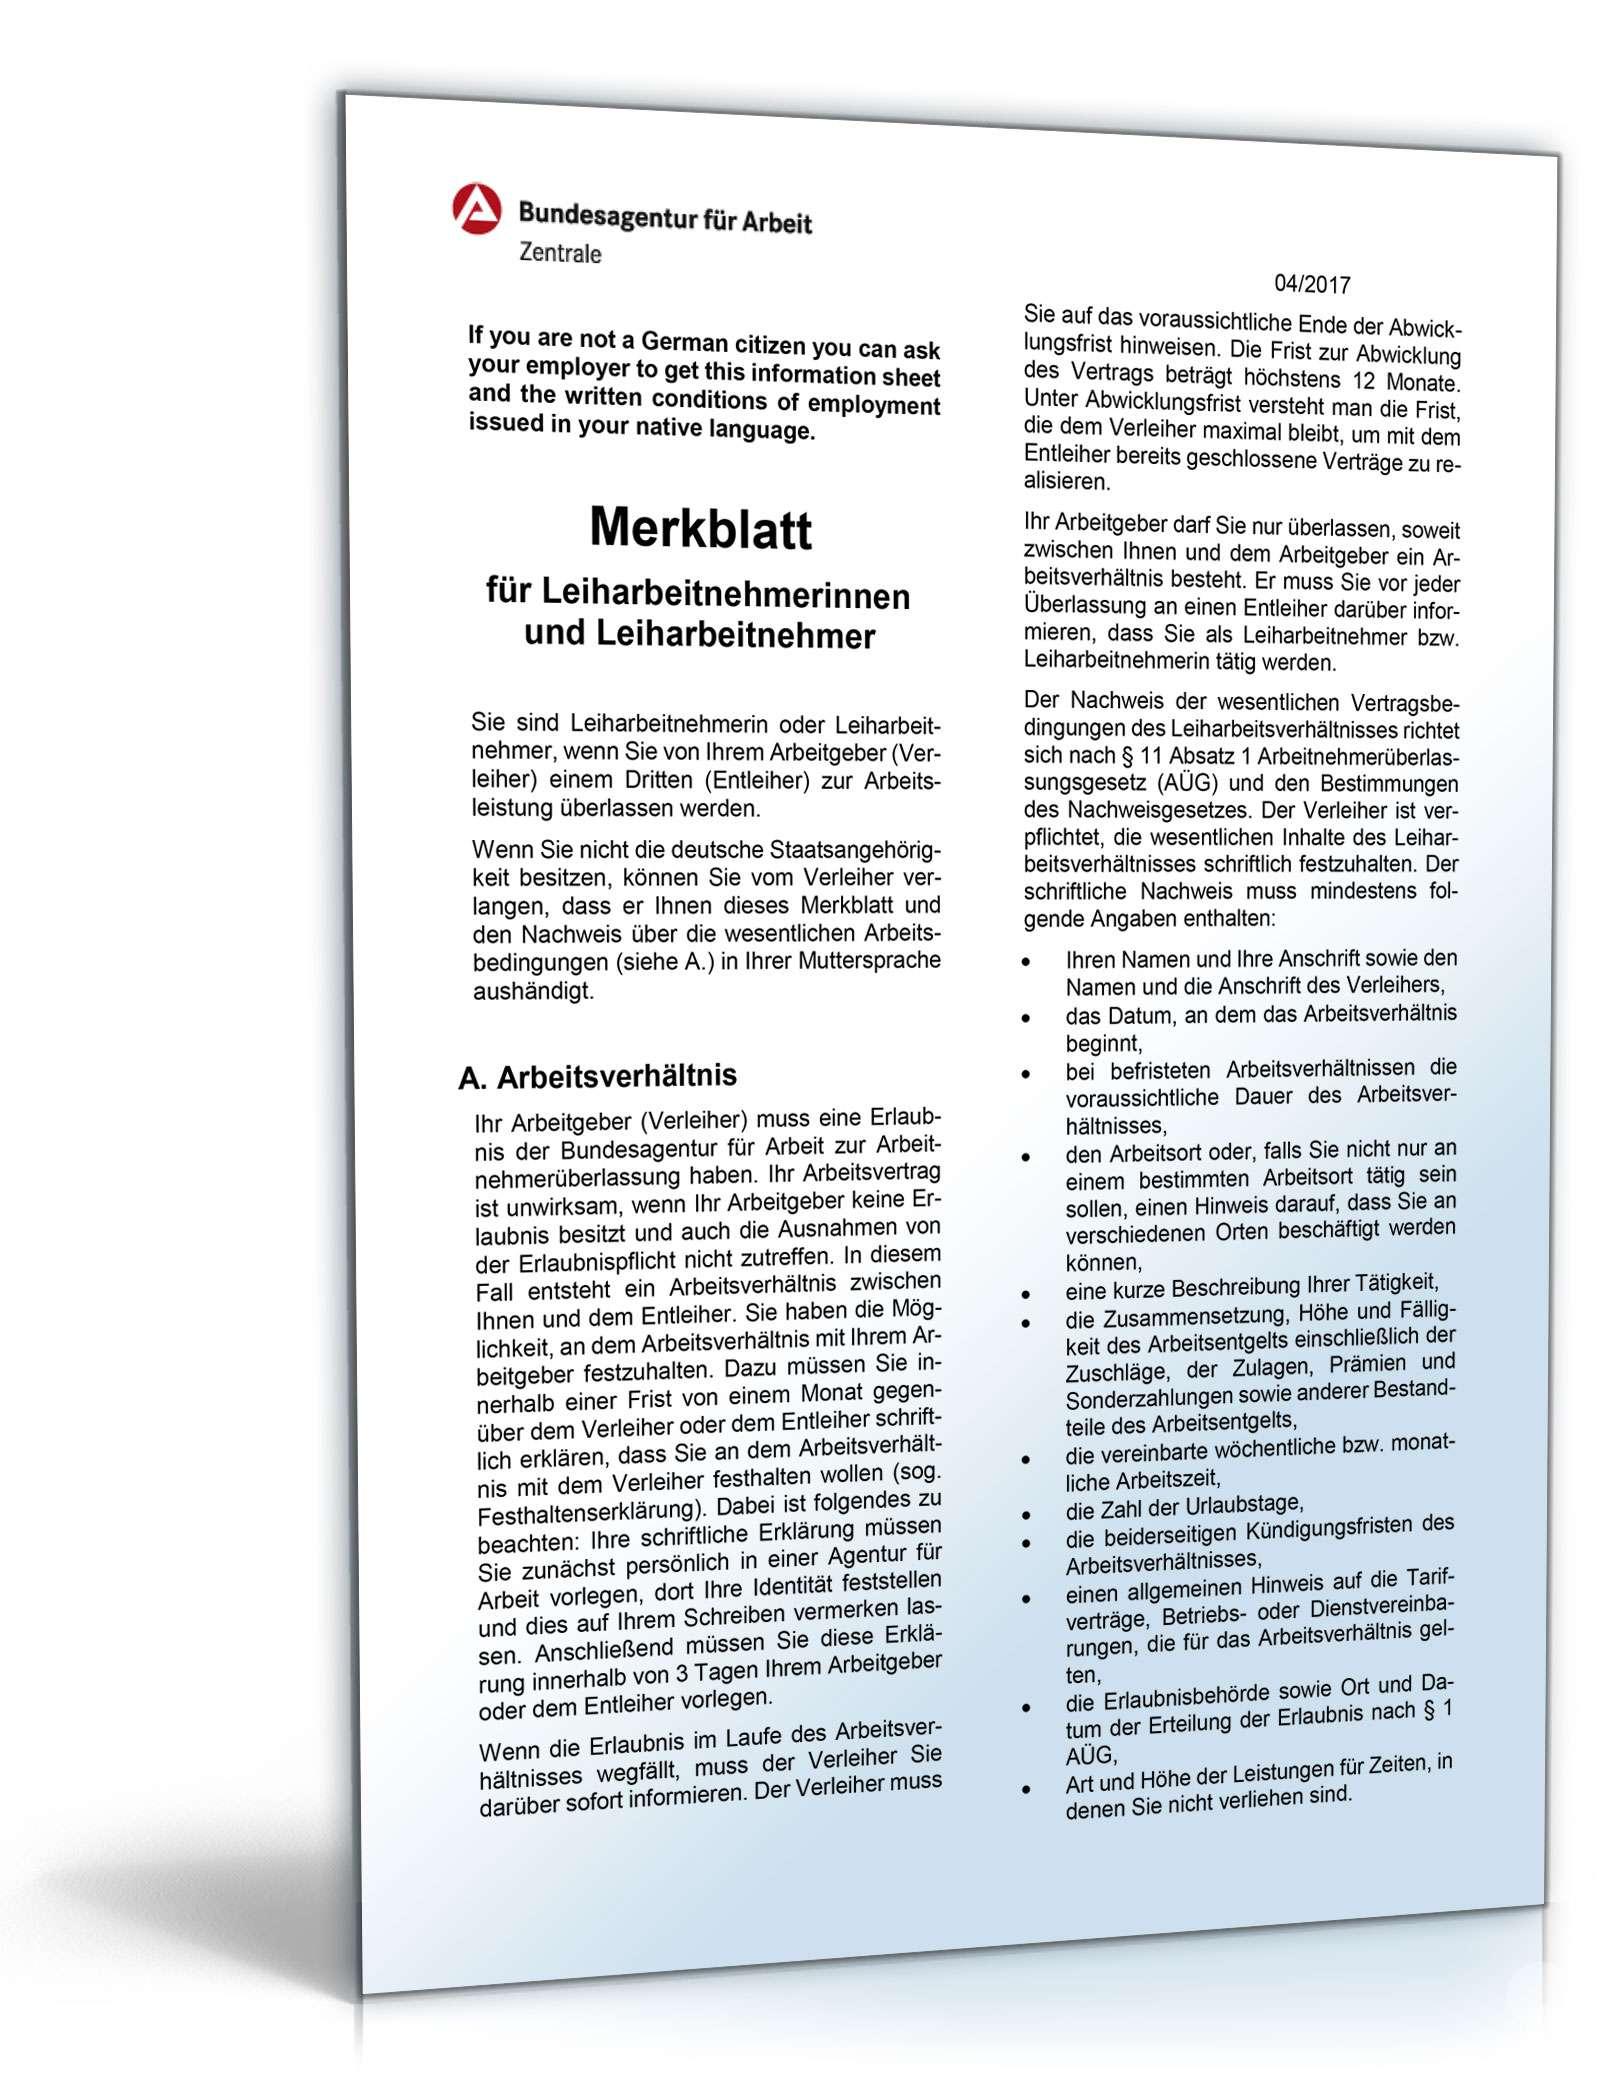 merkblatt fr leiharbeitnehmer - Arbeitnehmeruberlassungsvertrag Muster